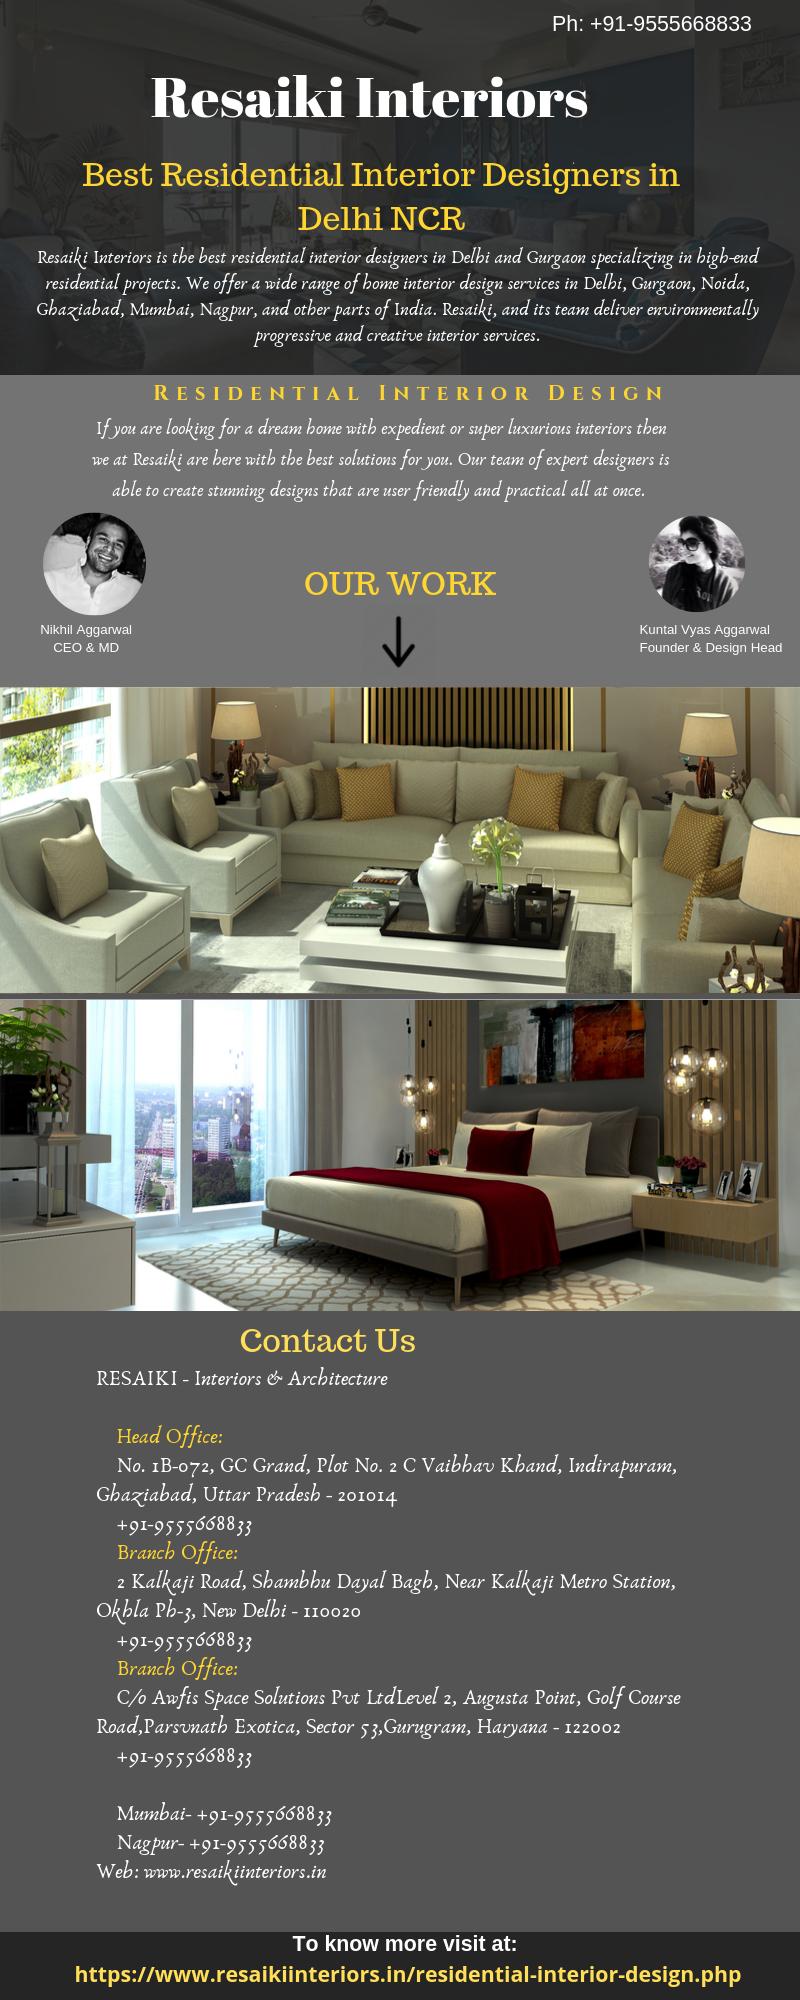 Resaiki Interiors Is One Of The Leading Residential Interior Designers In Delhi G Residential Interior Interior Designers In Delhi Residential Interior Design